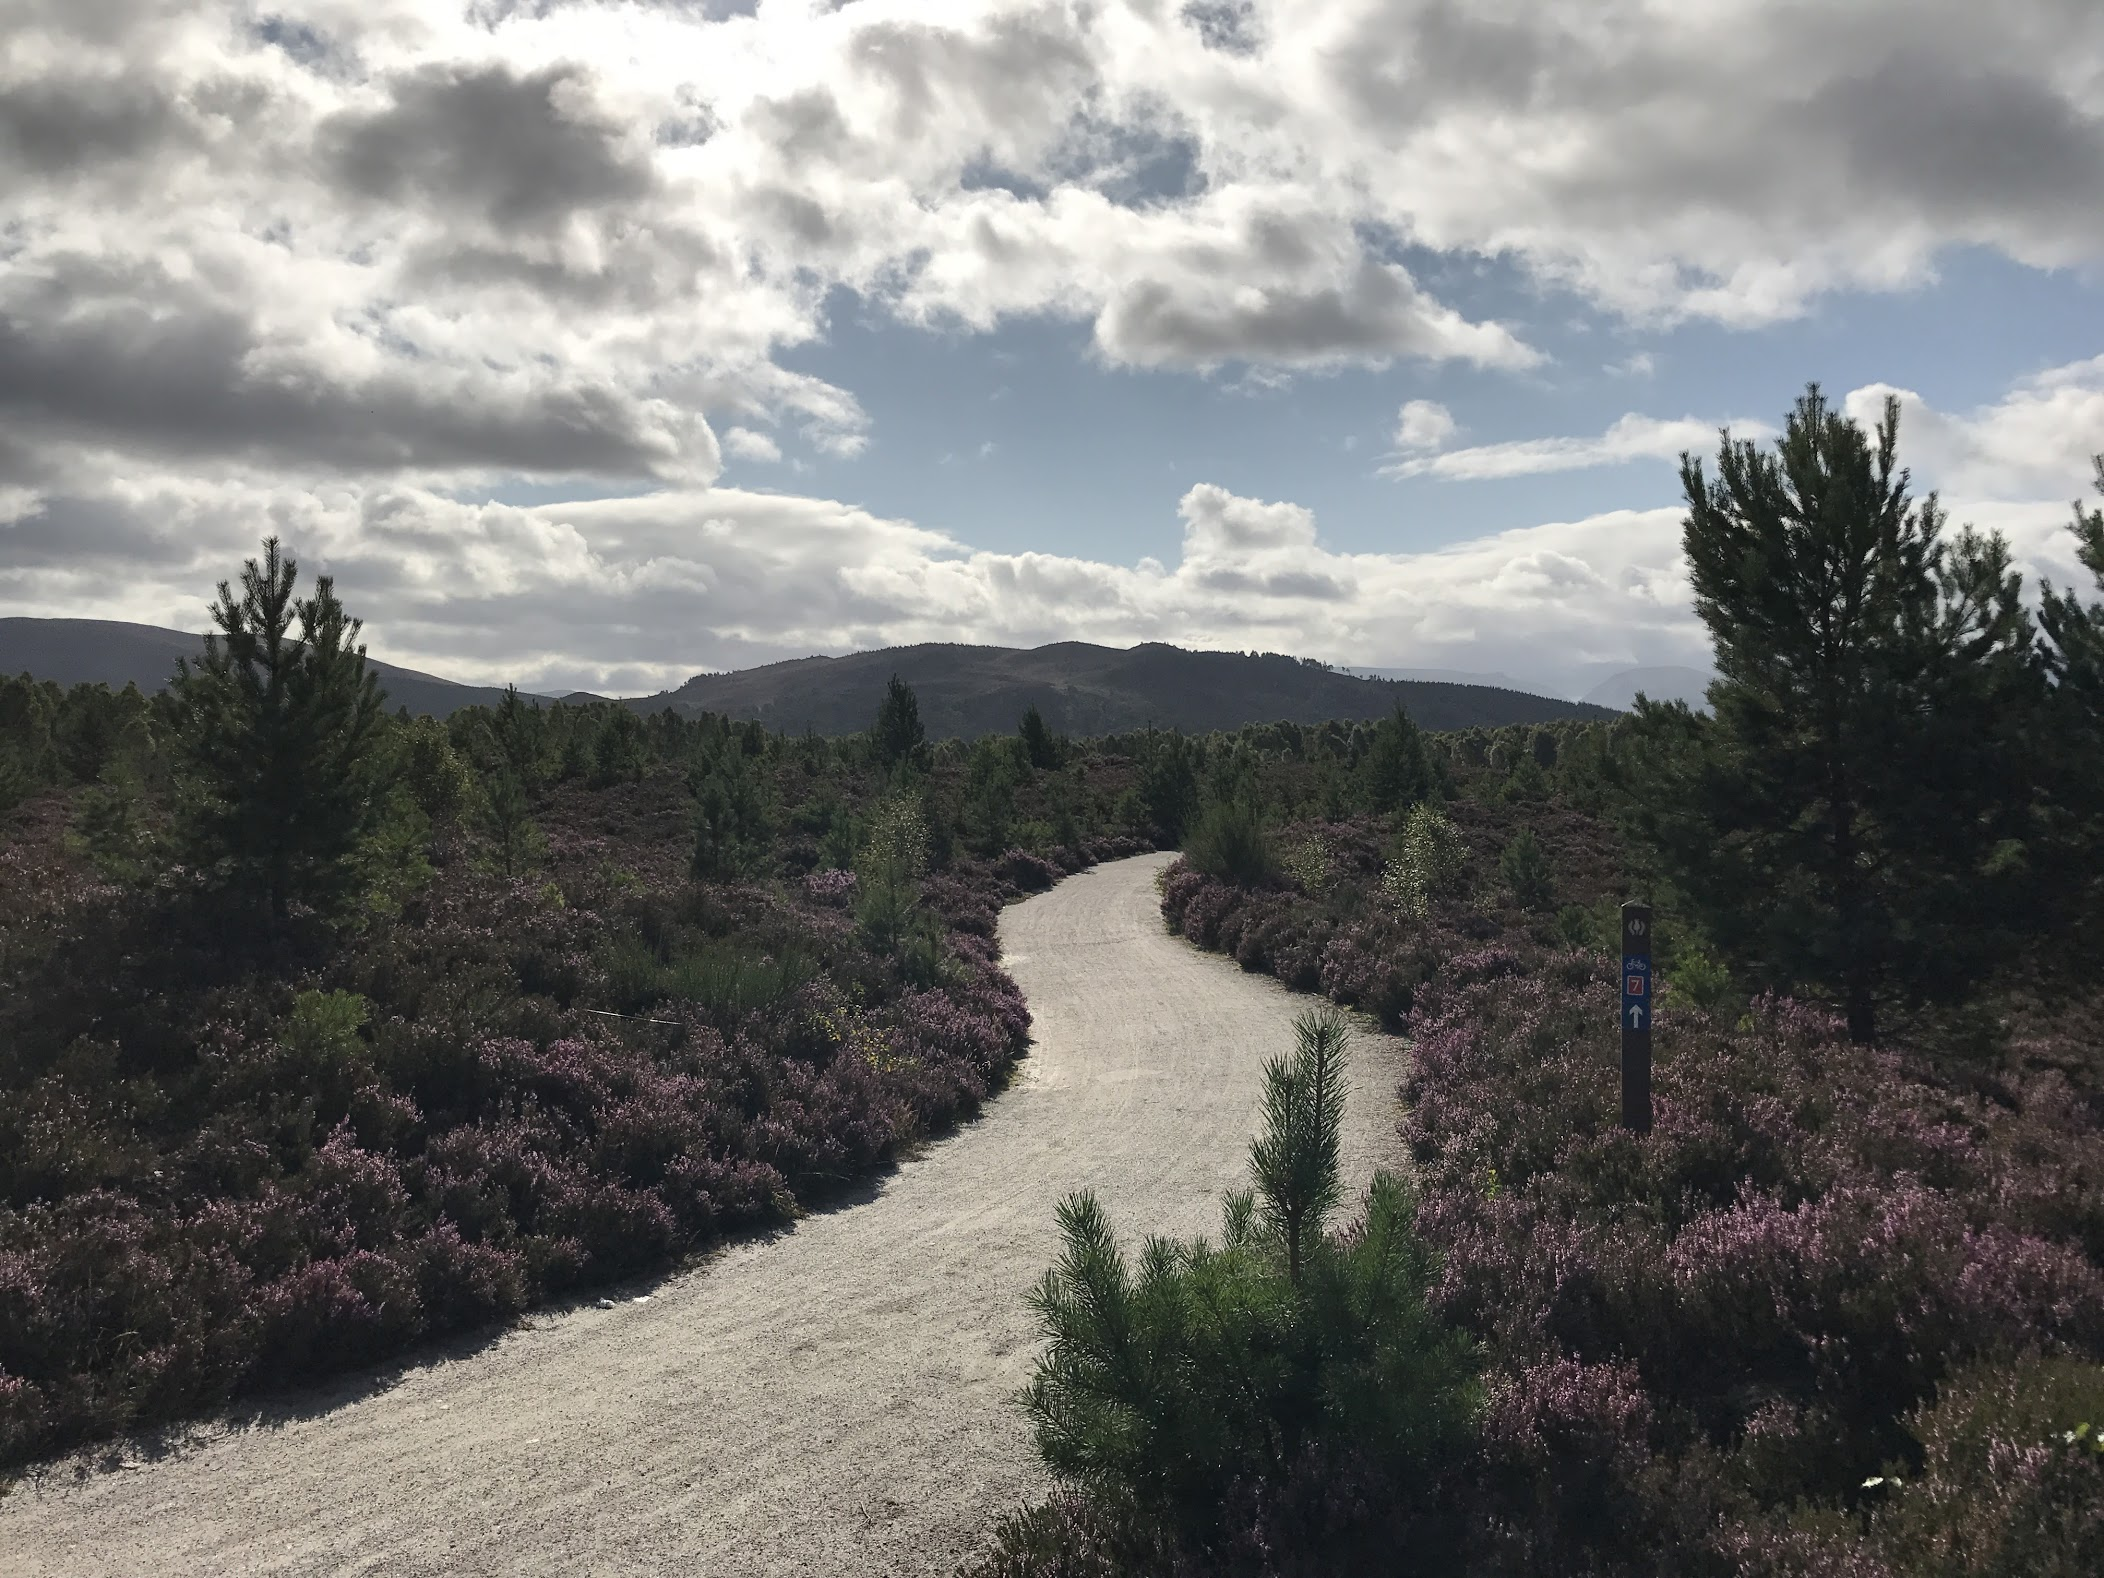 Highlands Walkshop - Aug 25th - Aug 31st, 2017